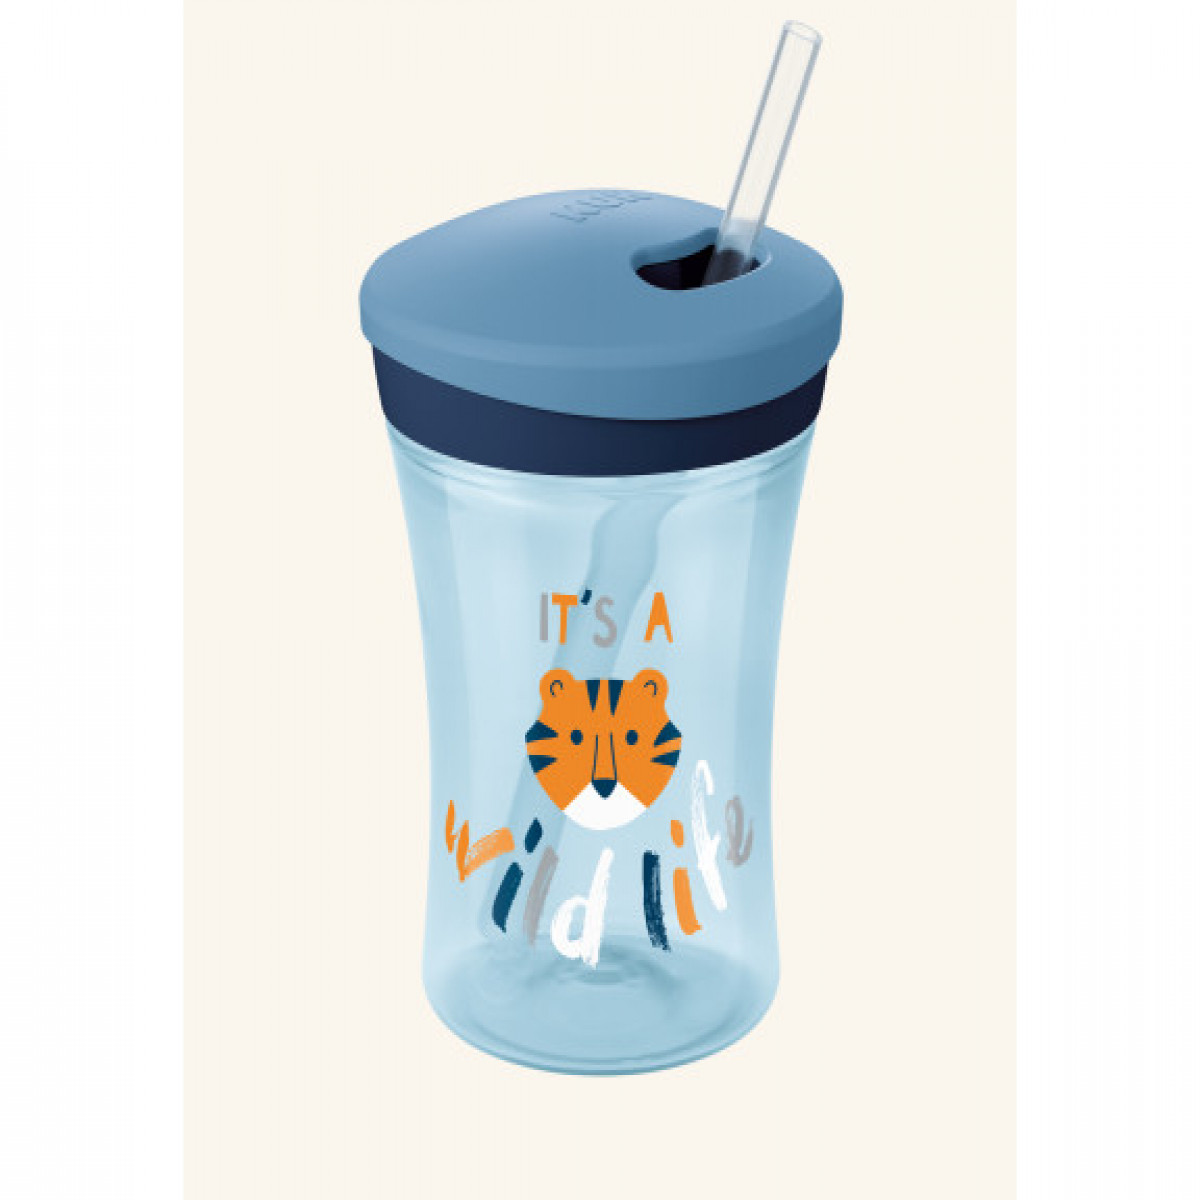 Vaso Evolution Action Cup Nuk azul